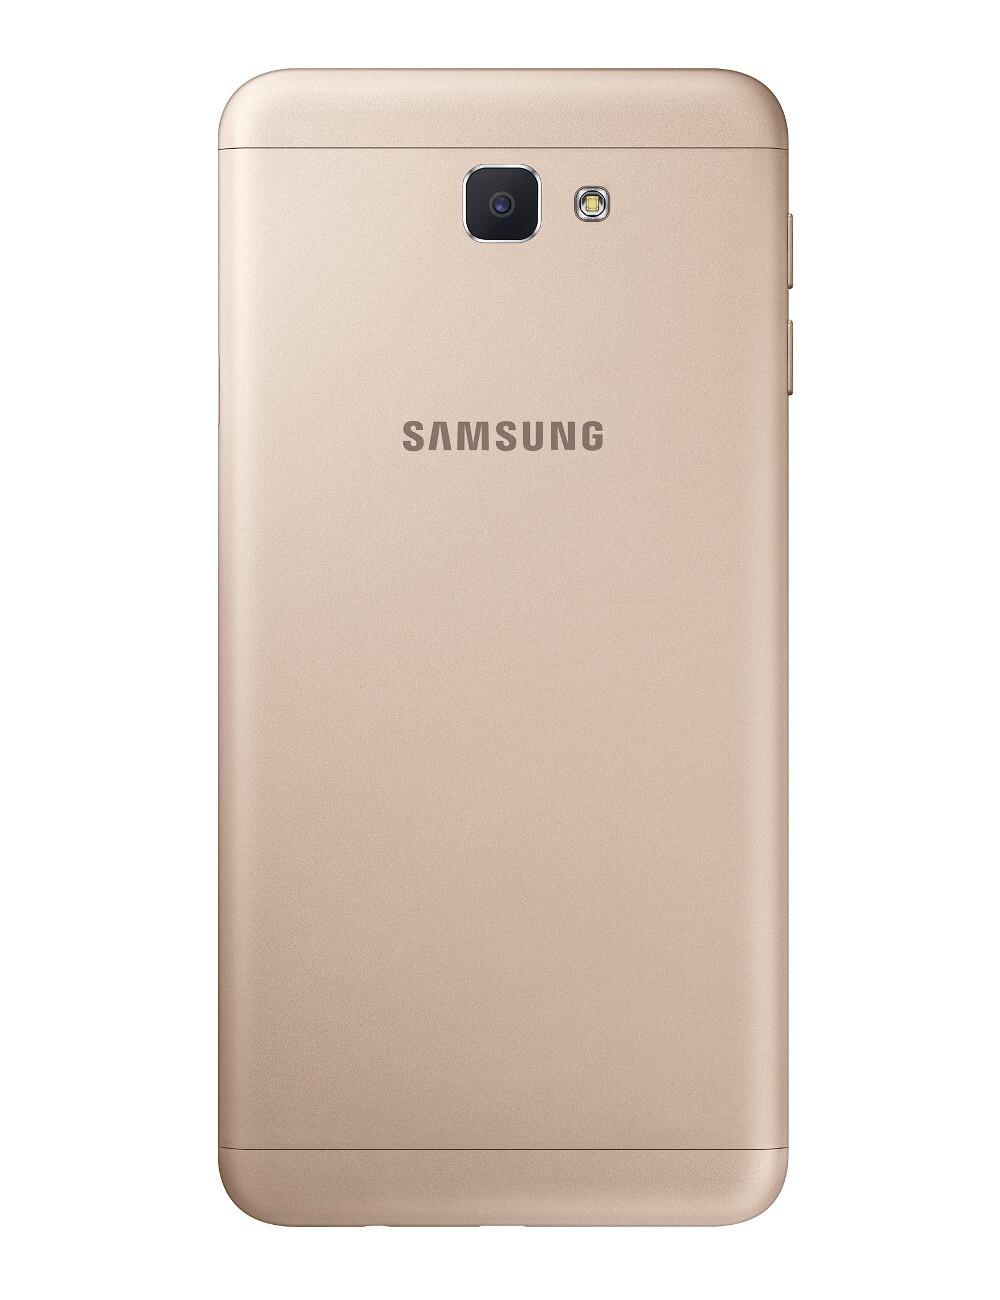 samsung galaxy 3 phone manual